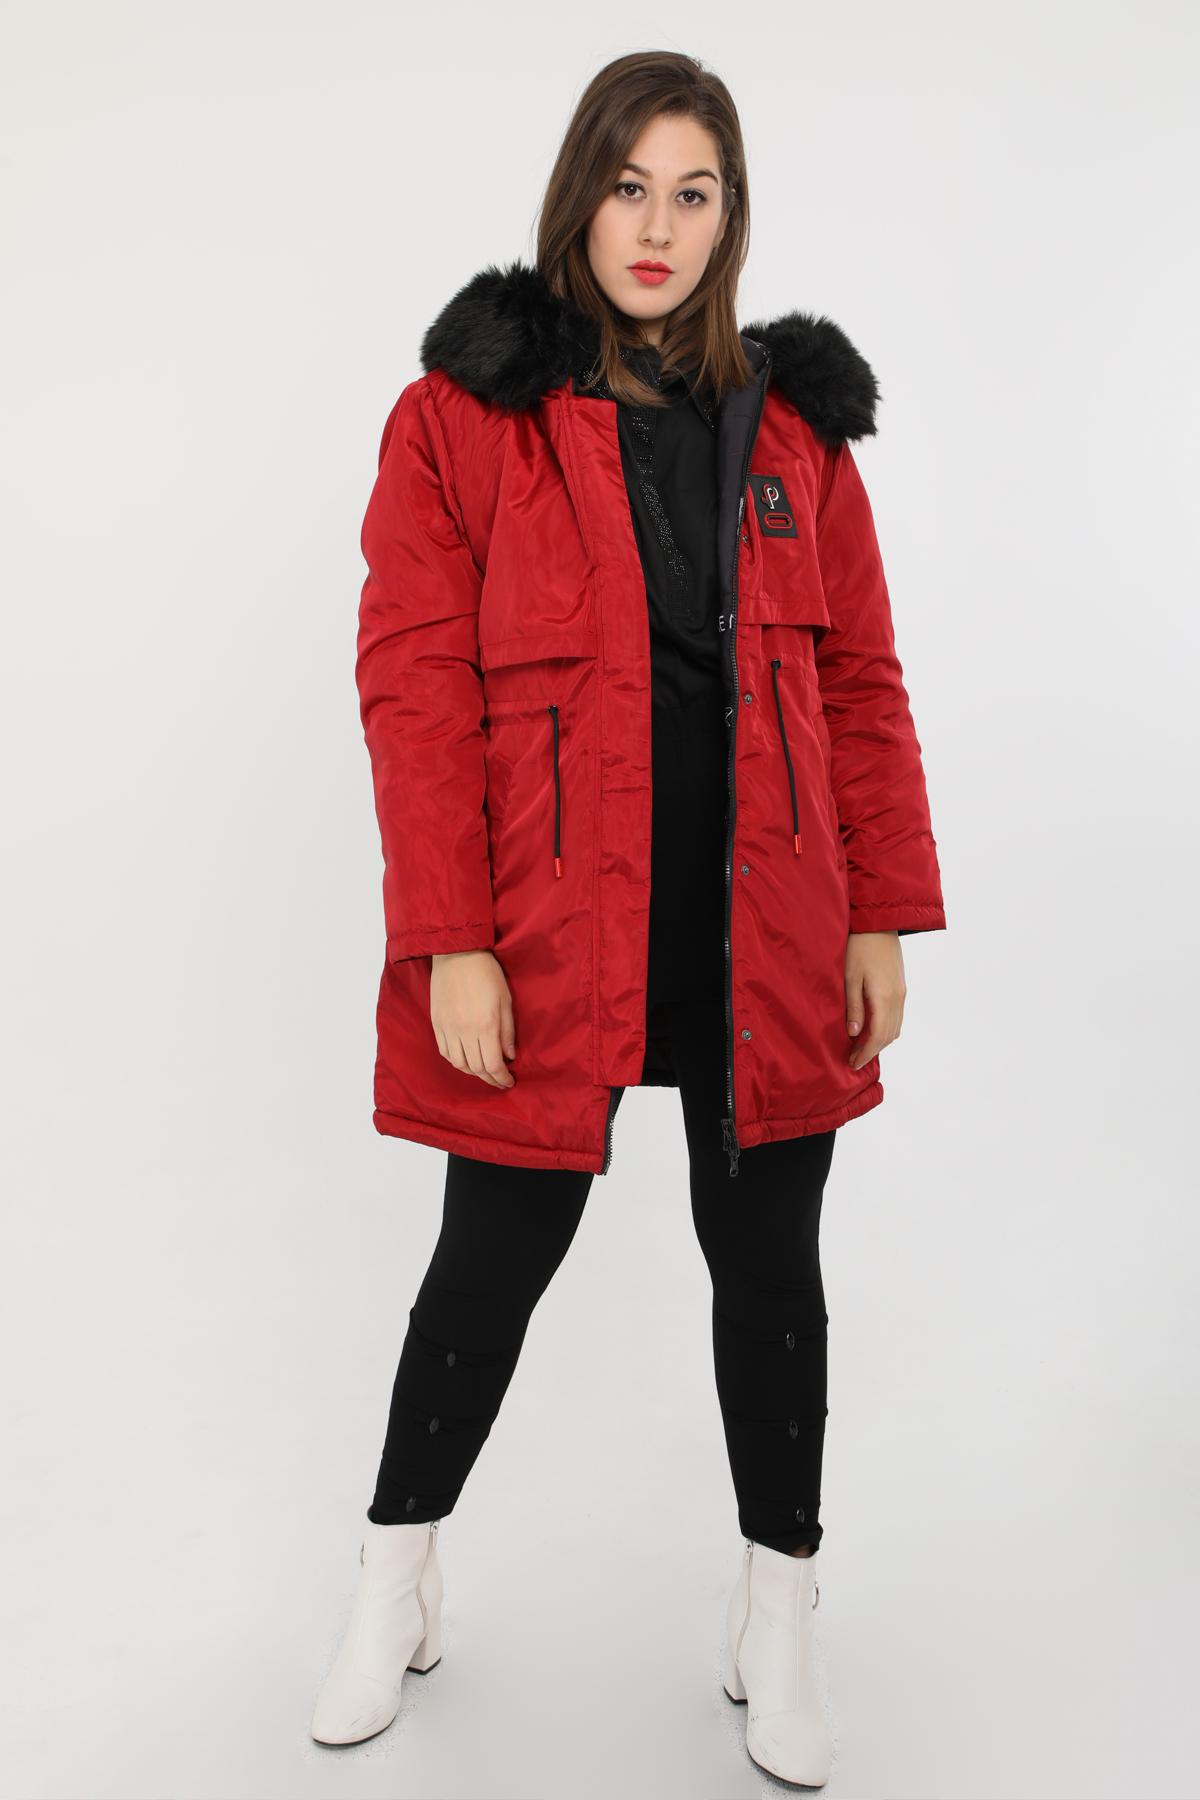 manteau grande taille femme pomme rouge c6171 rouge 42-56